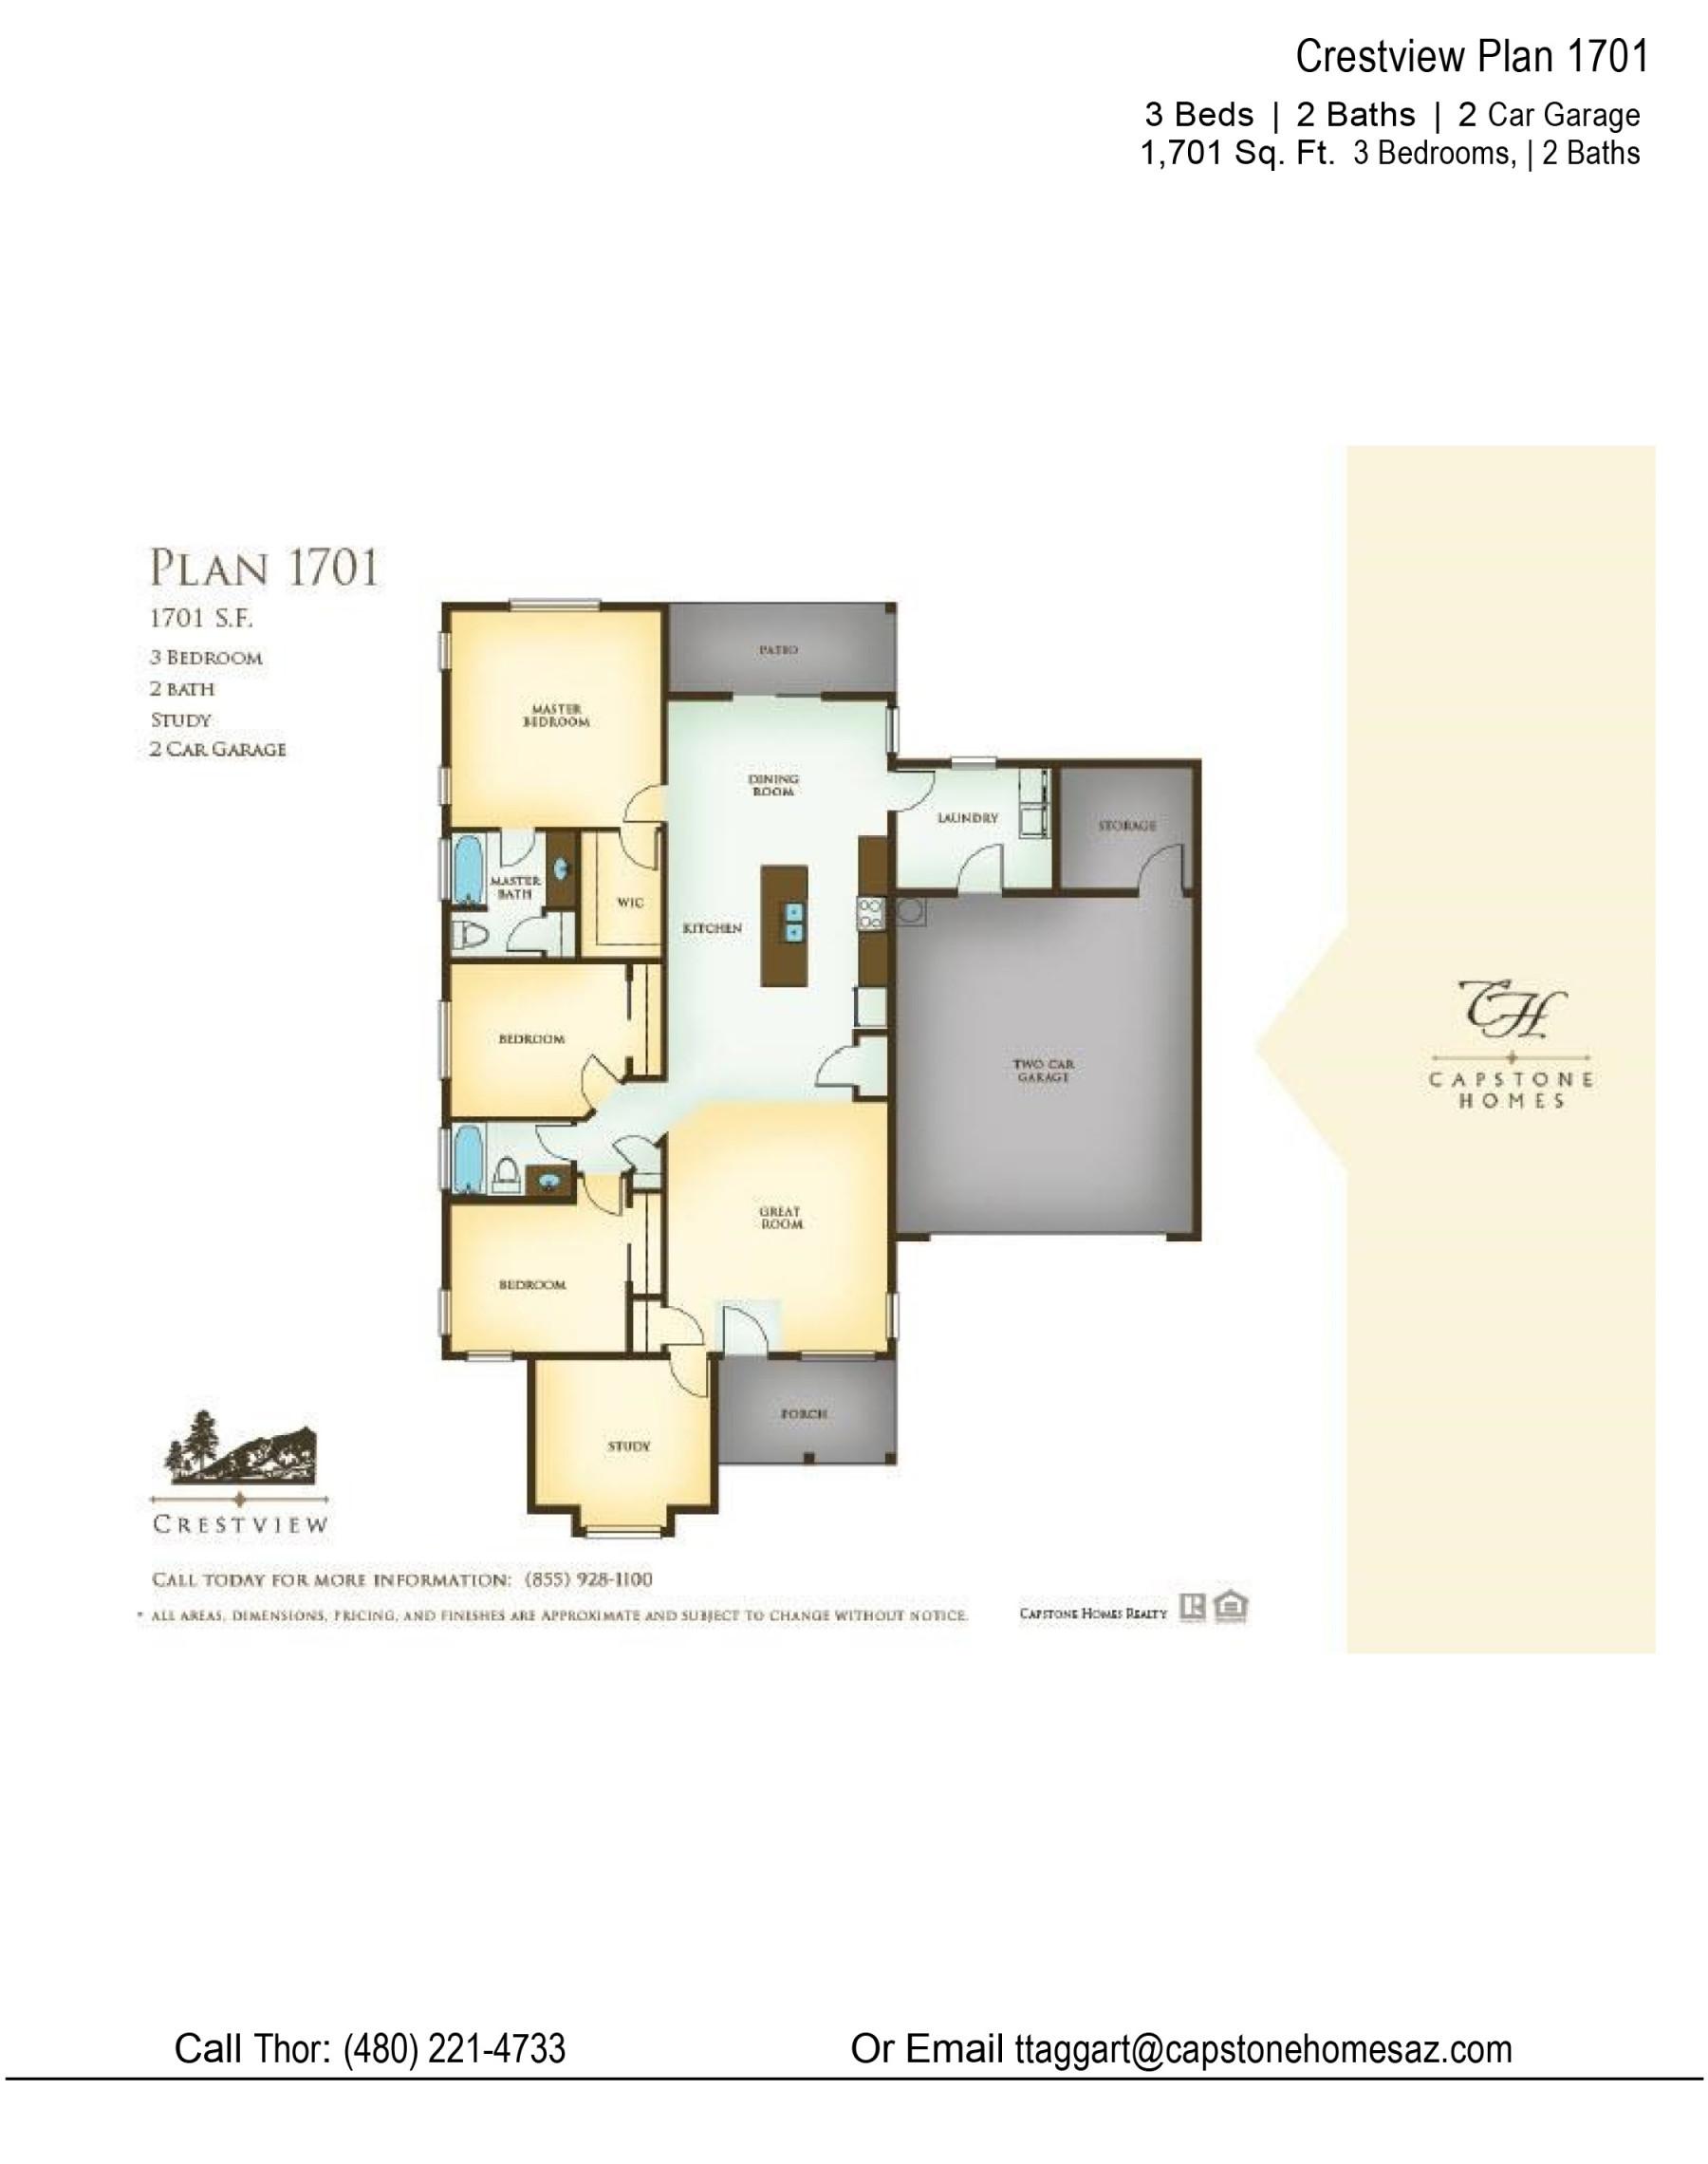 Crestview 1701 Plan